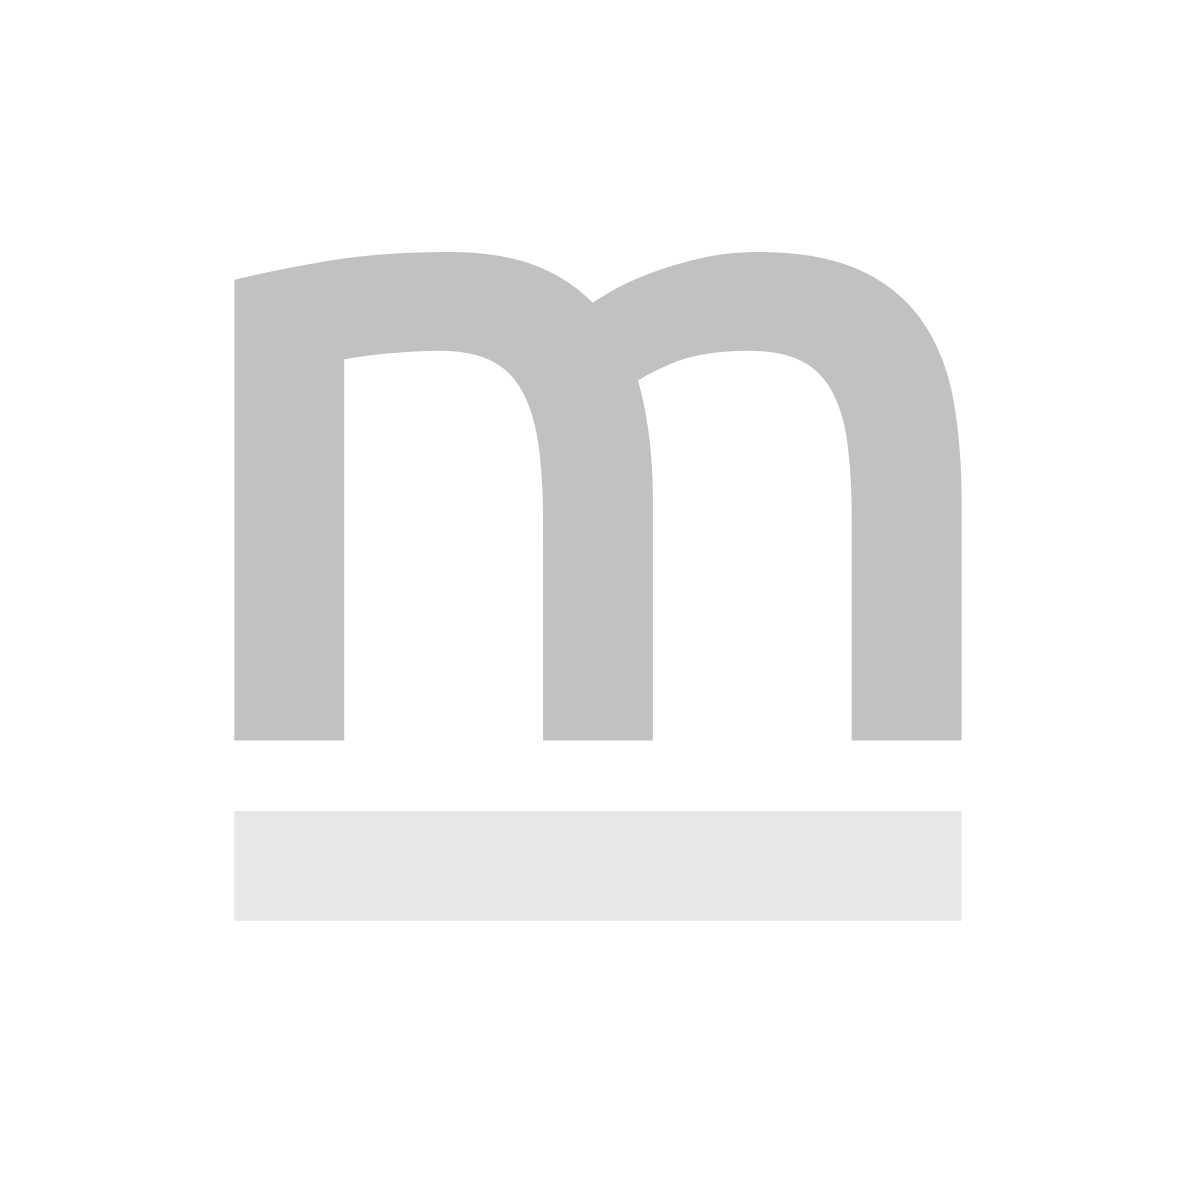 Lustro łazienkowe RUBINO CLOUD I 80